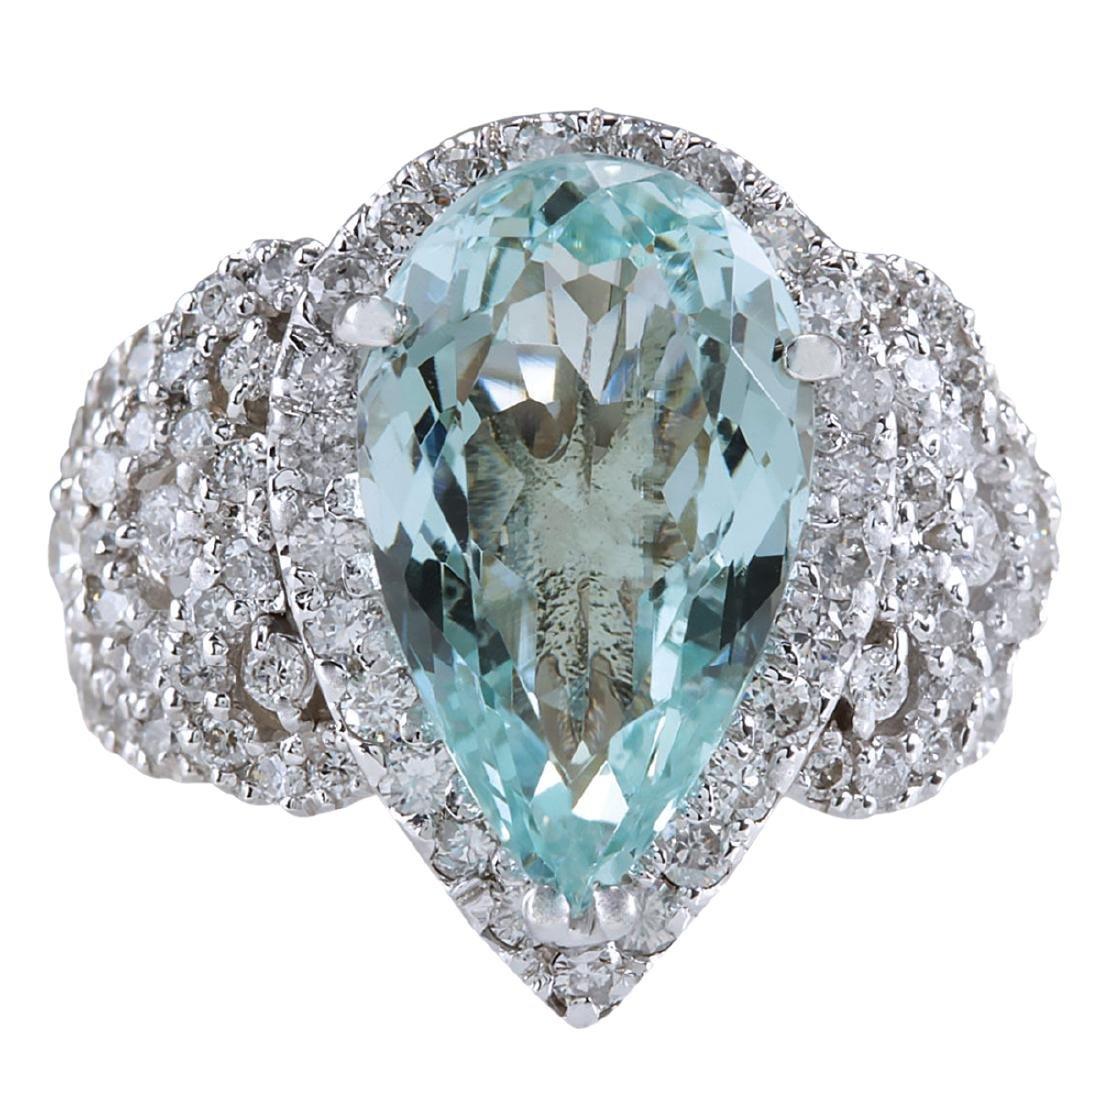 7.30CTW Natural Aquamarine And Diamond Ring In 18K